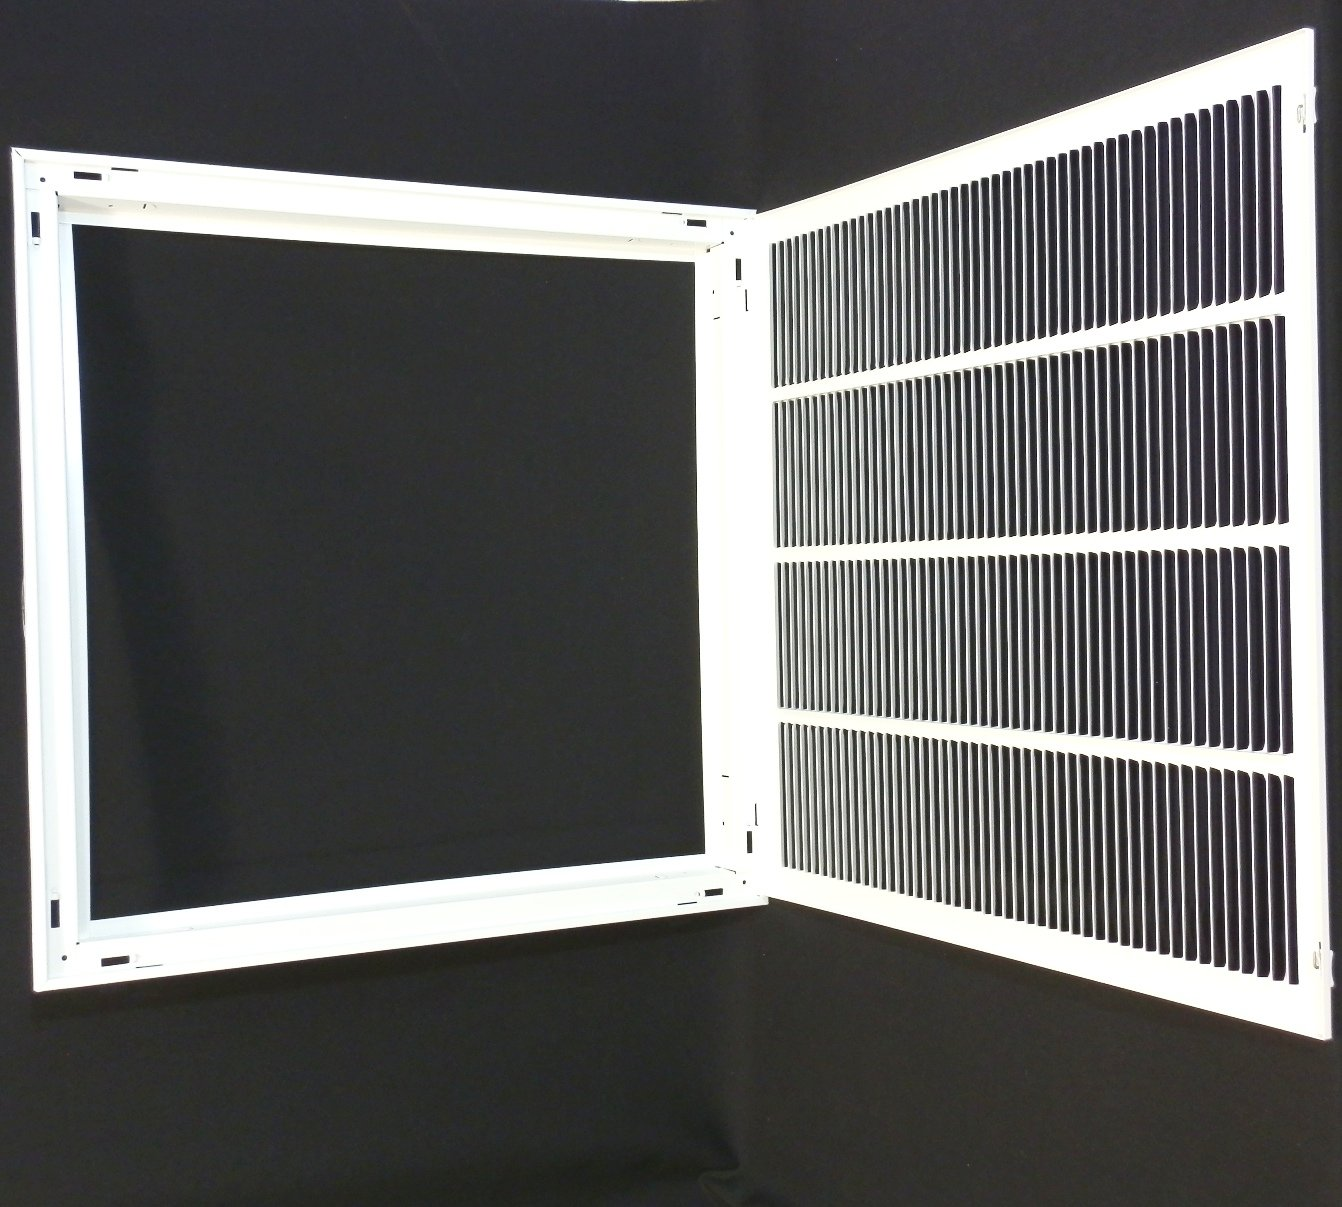 Hvac Return Air Grill : W quot h return filter grille hvac dcut cover flat